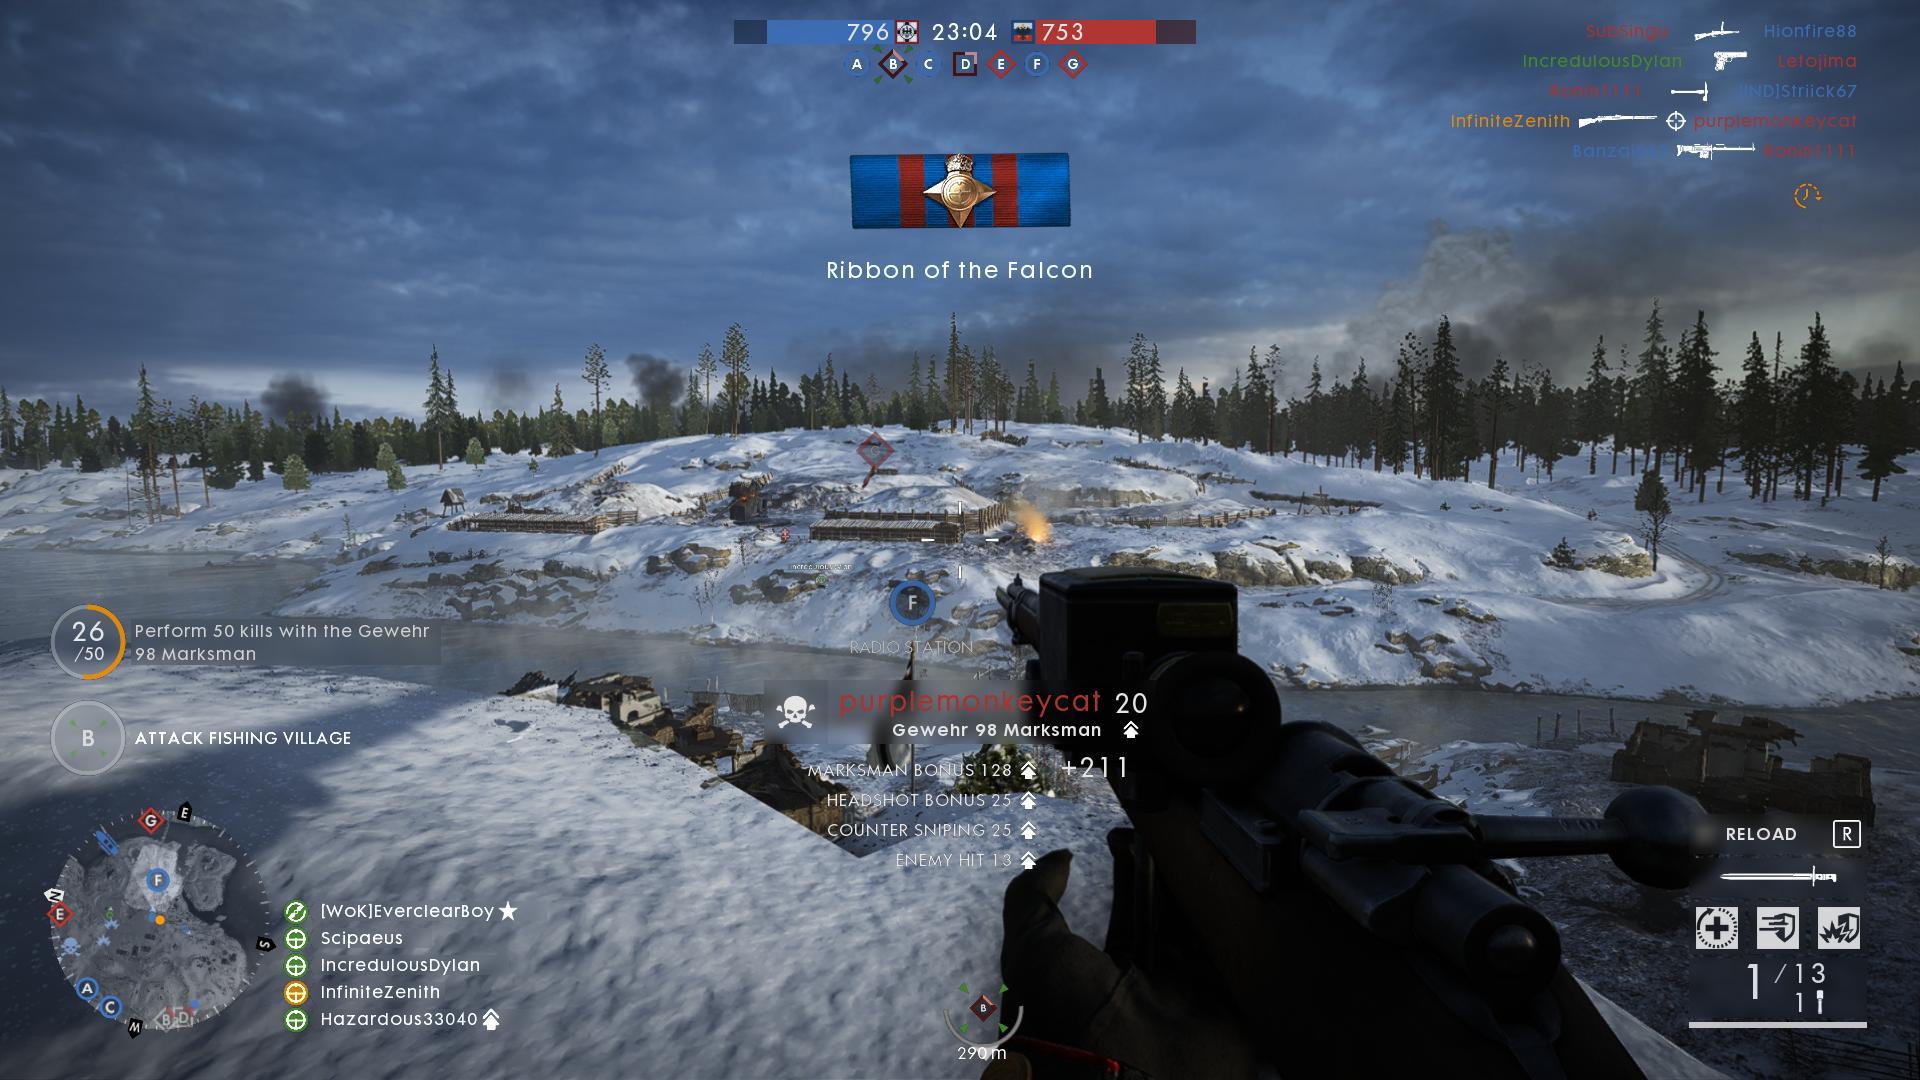 One Year of Service in Battlefield 1 | The Infinite Zenith